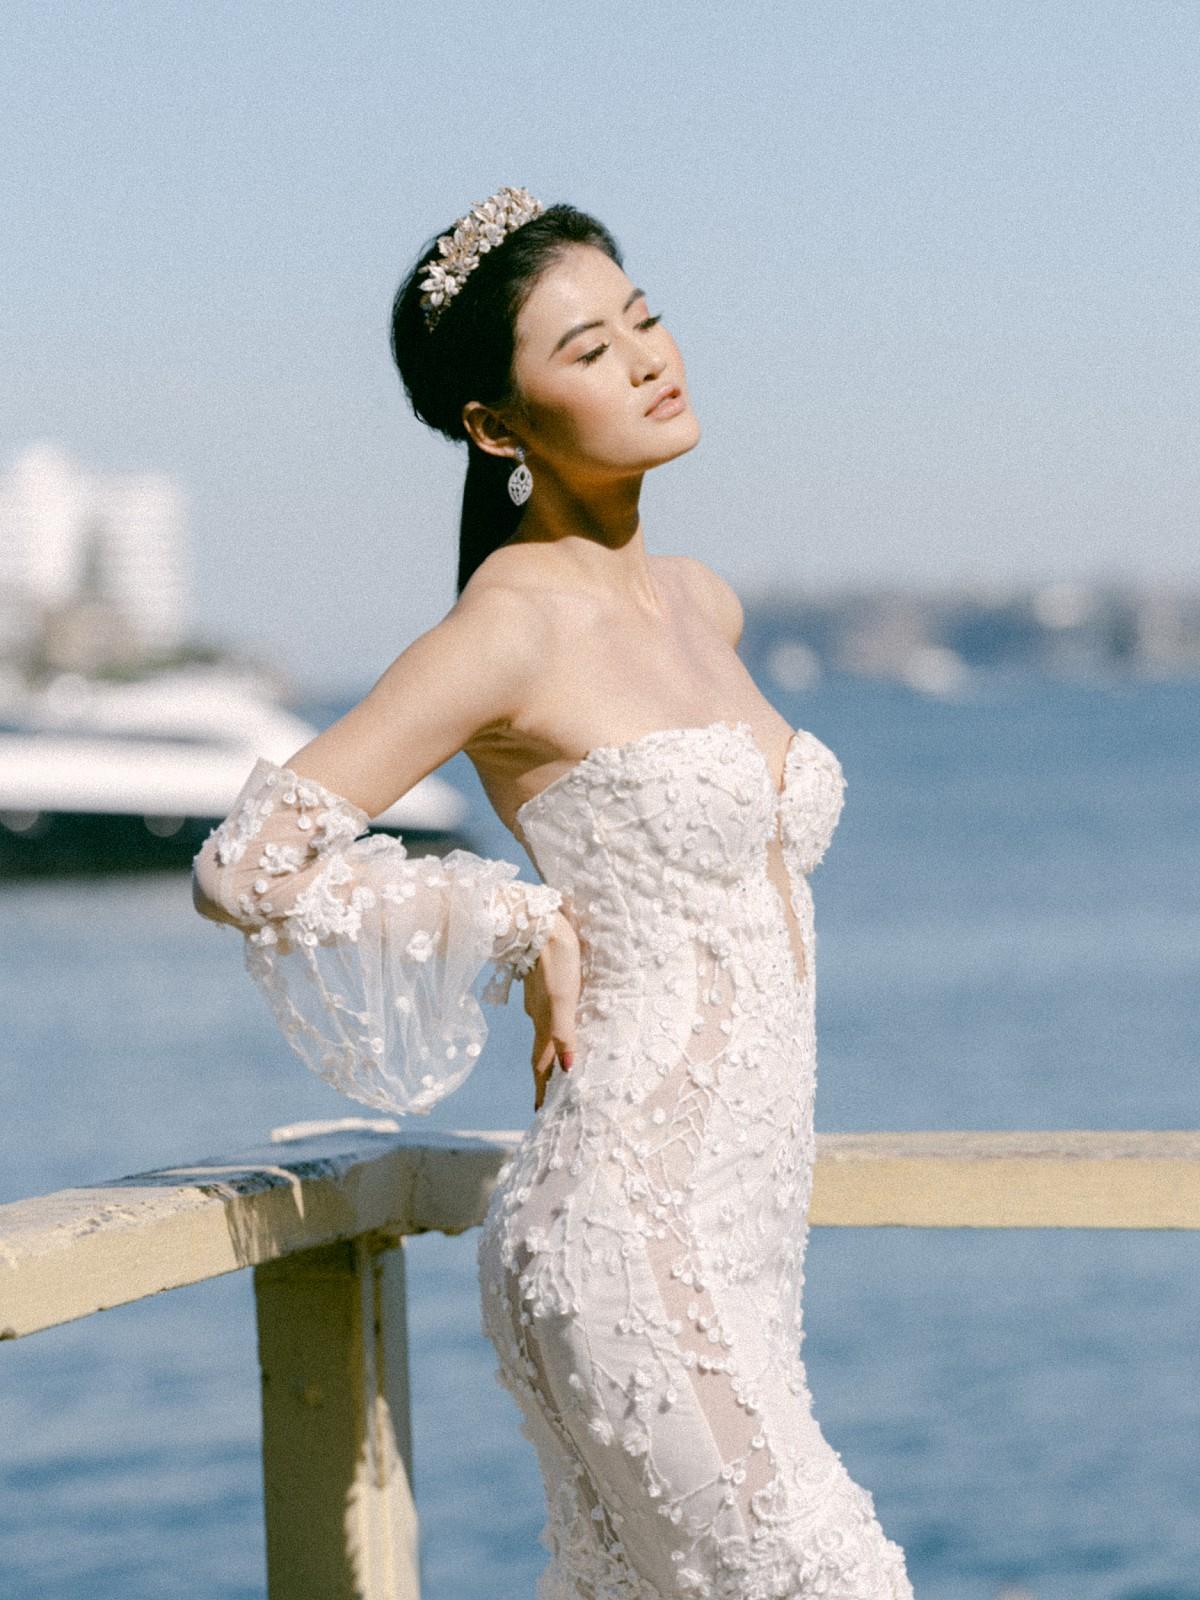 Australian wedding photographer Serenity Photography